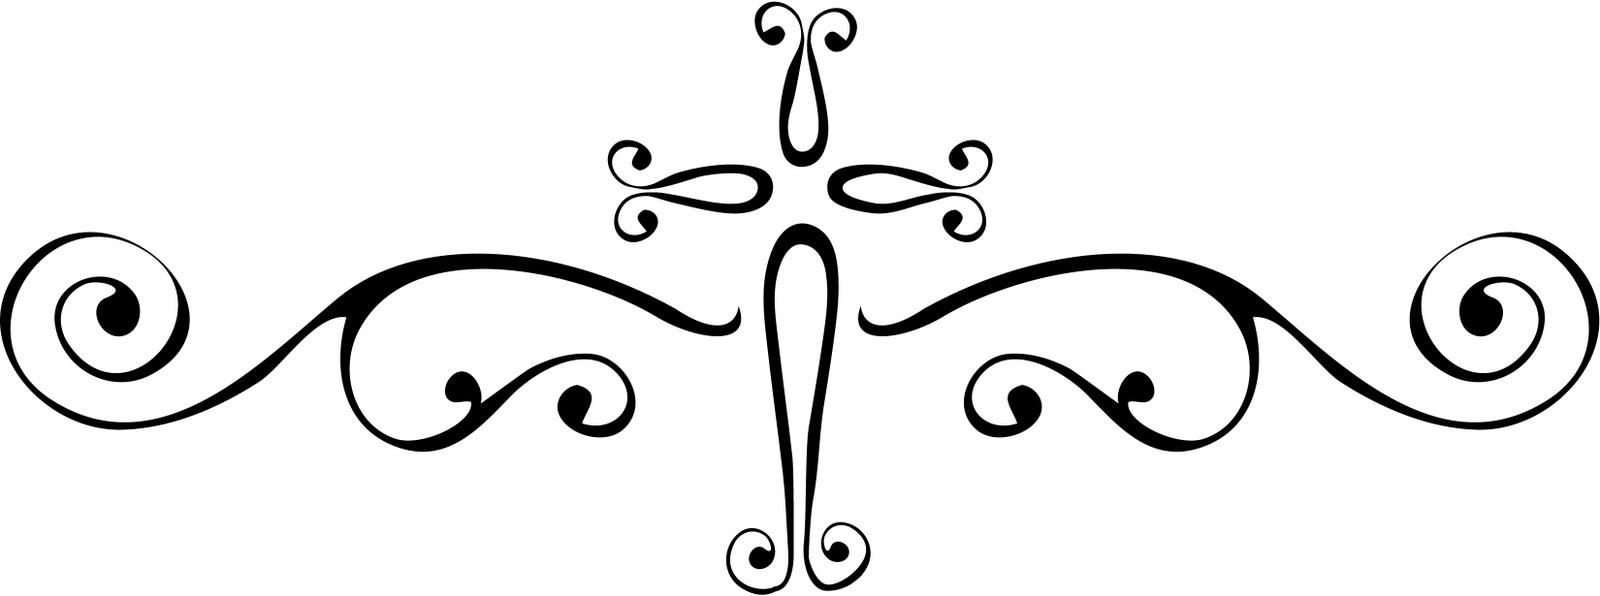 1600x596 Scroll Cross Clipart